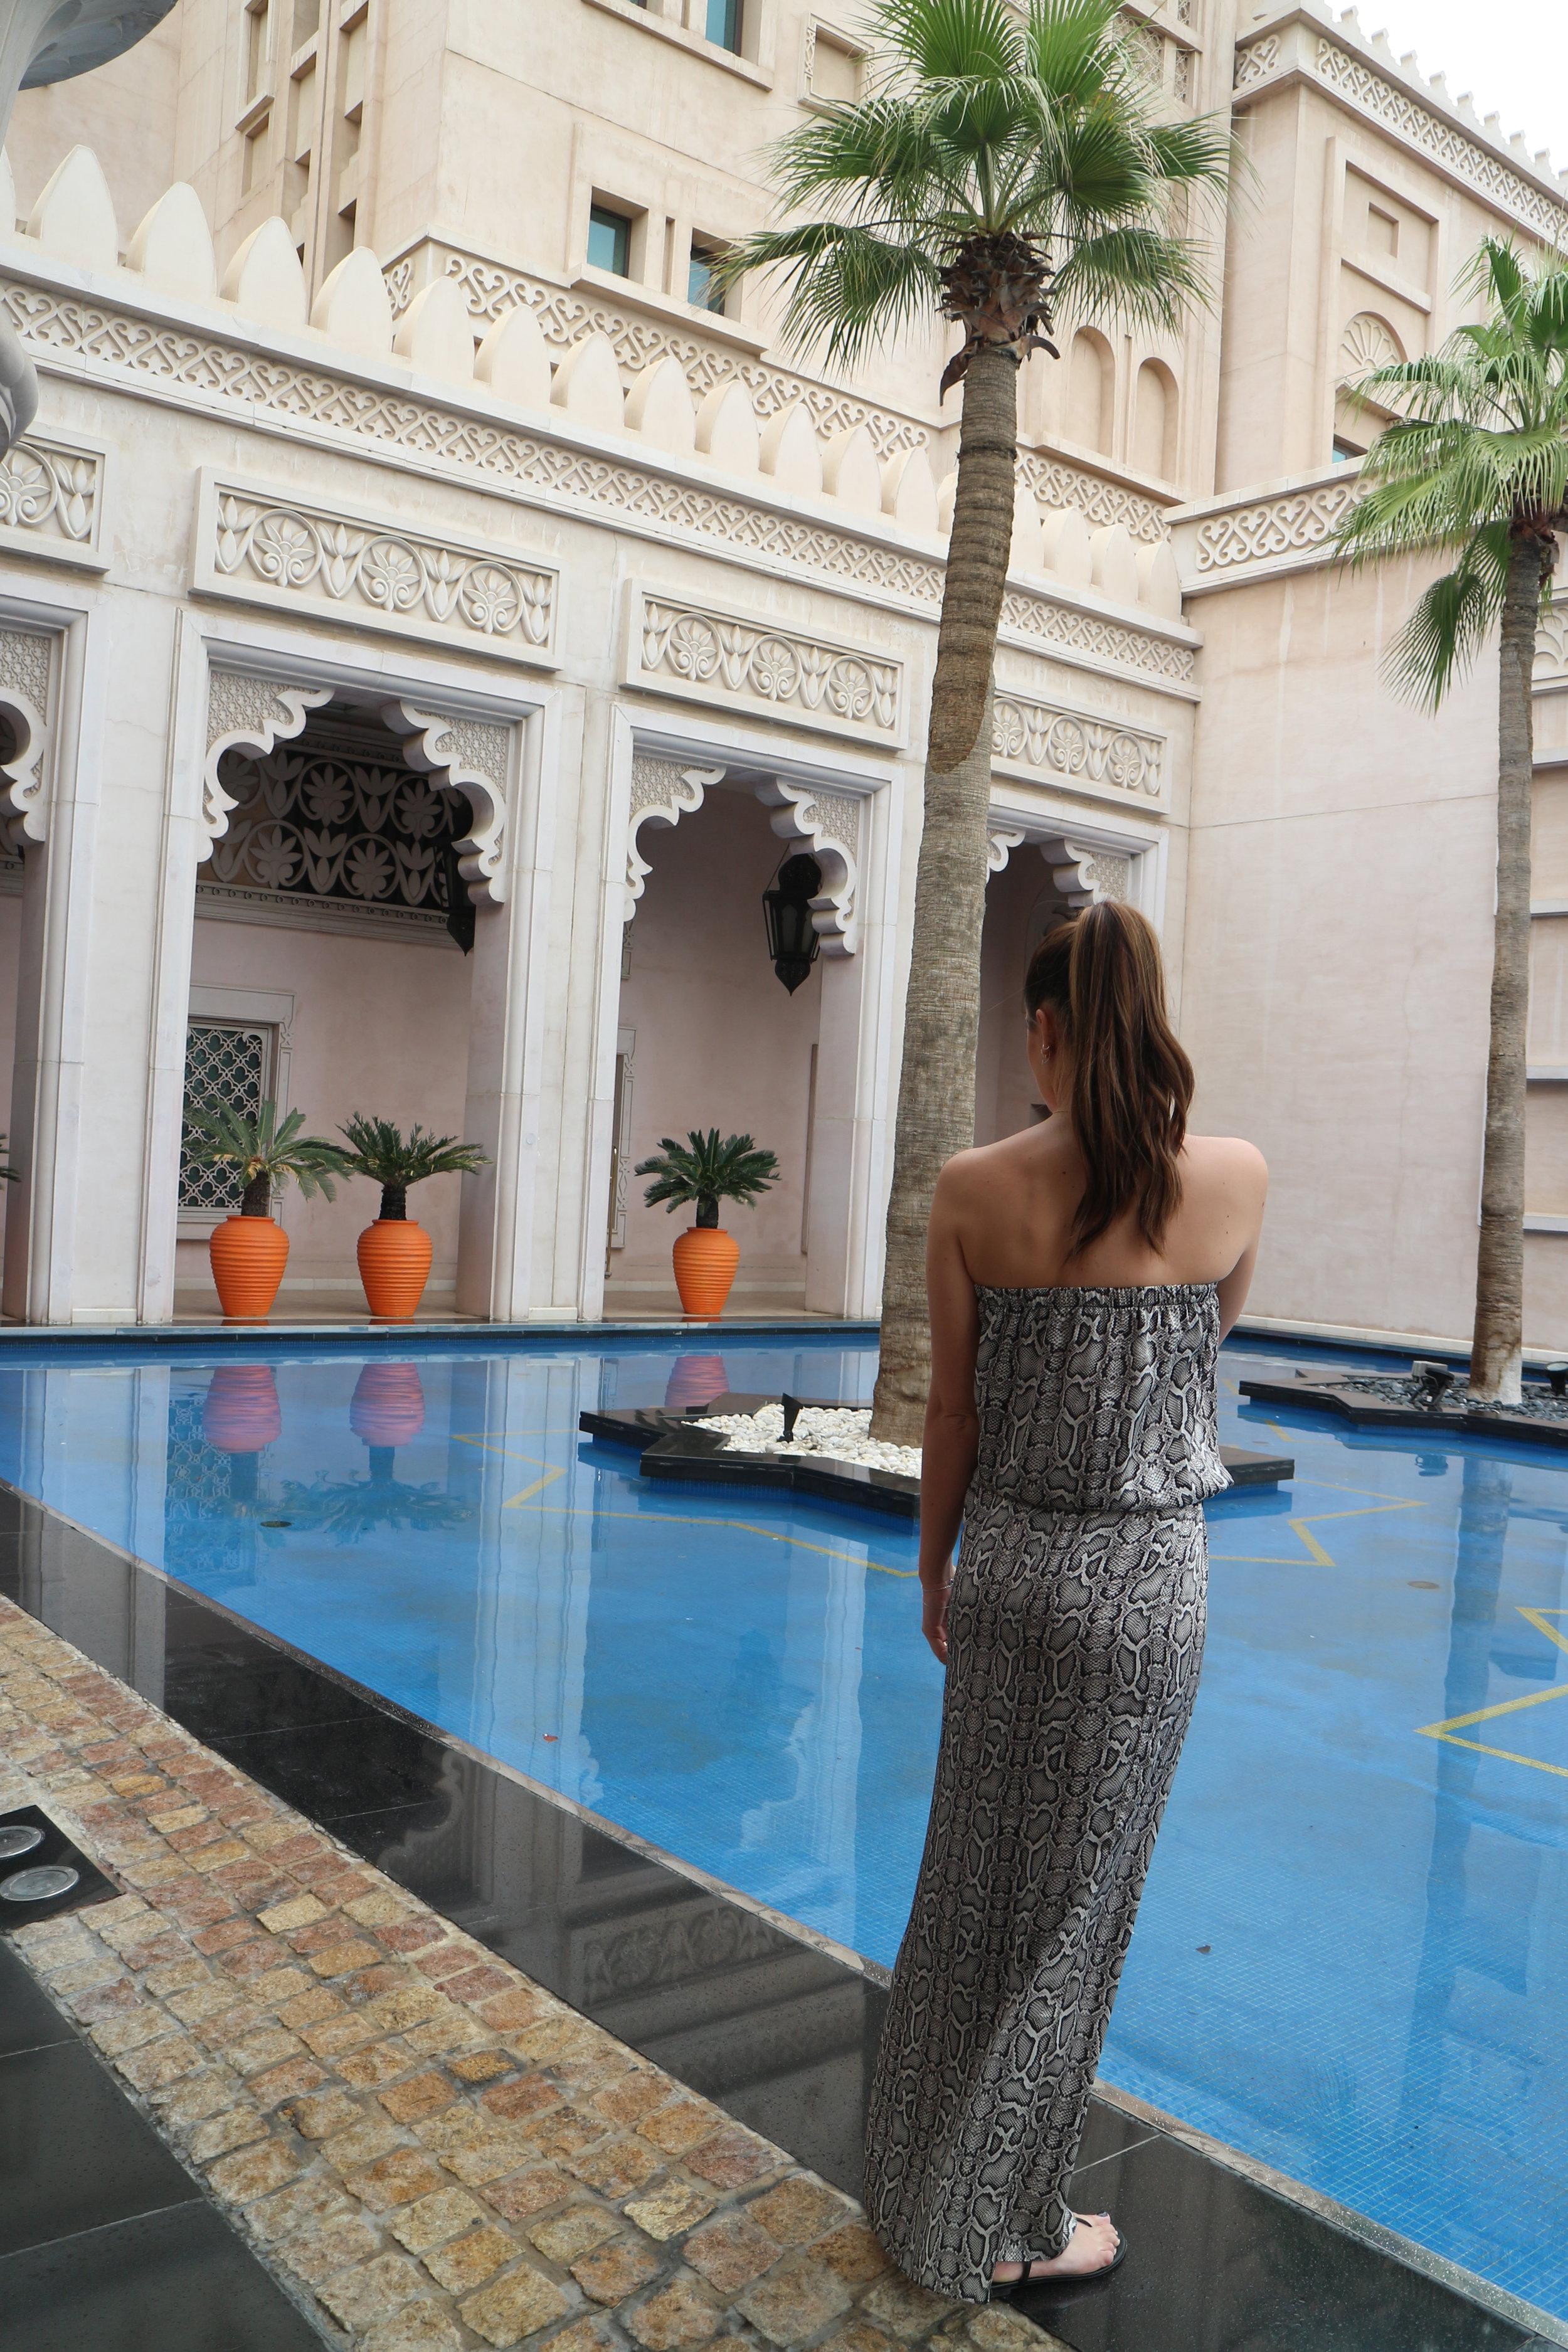 AL QSAR hotel